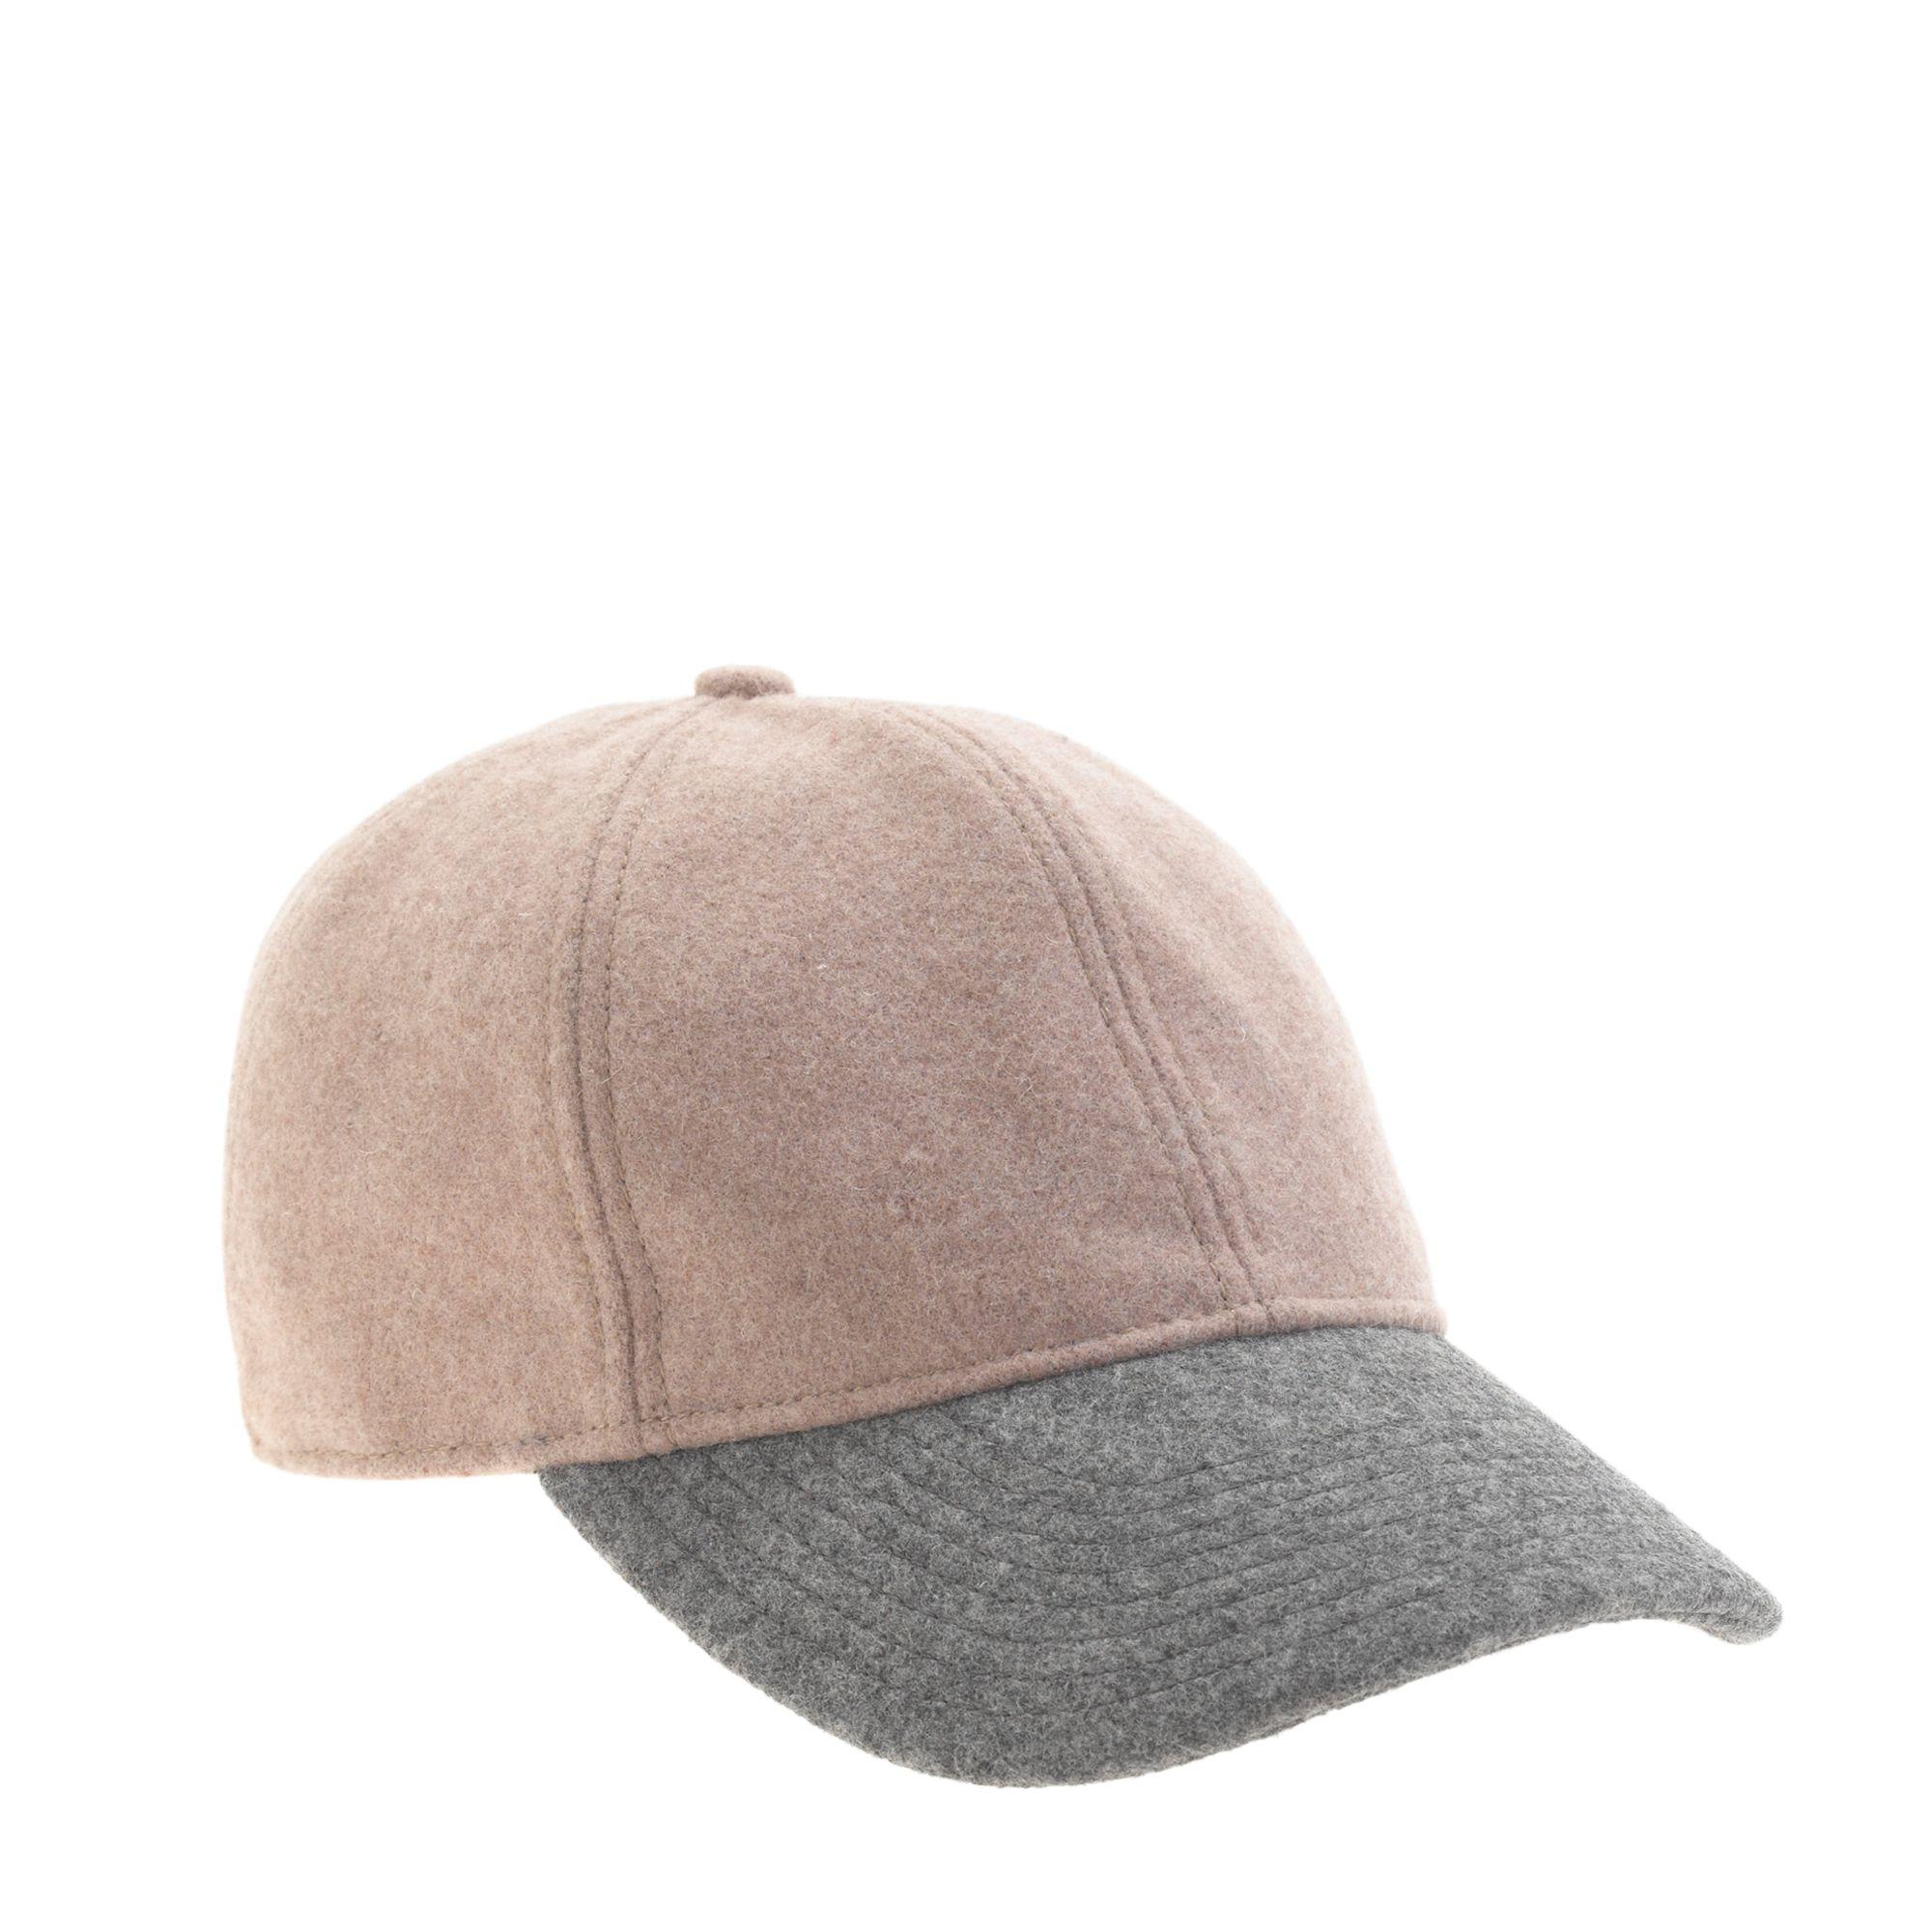 j crew colorblock wool baseball cap in beige beige grey